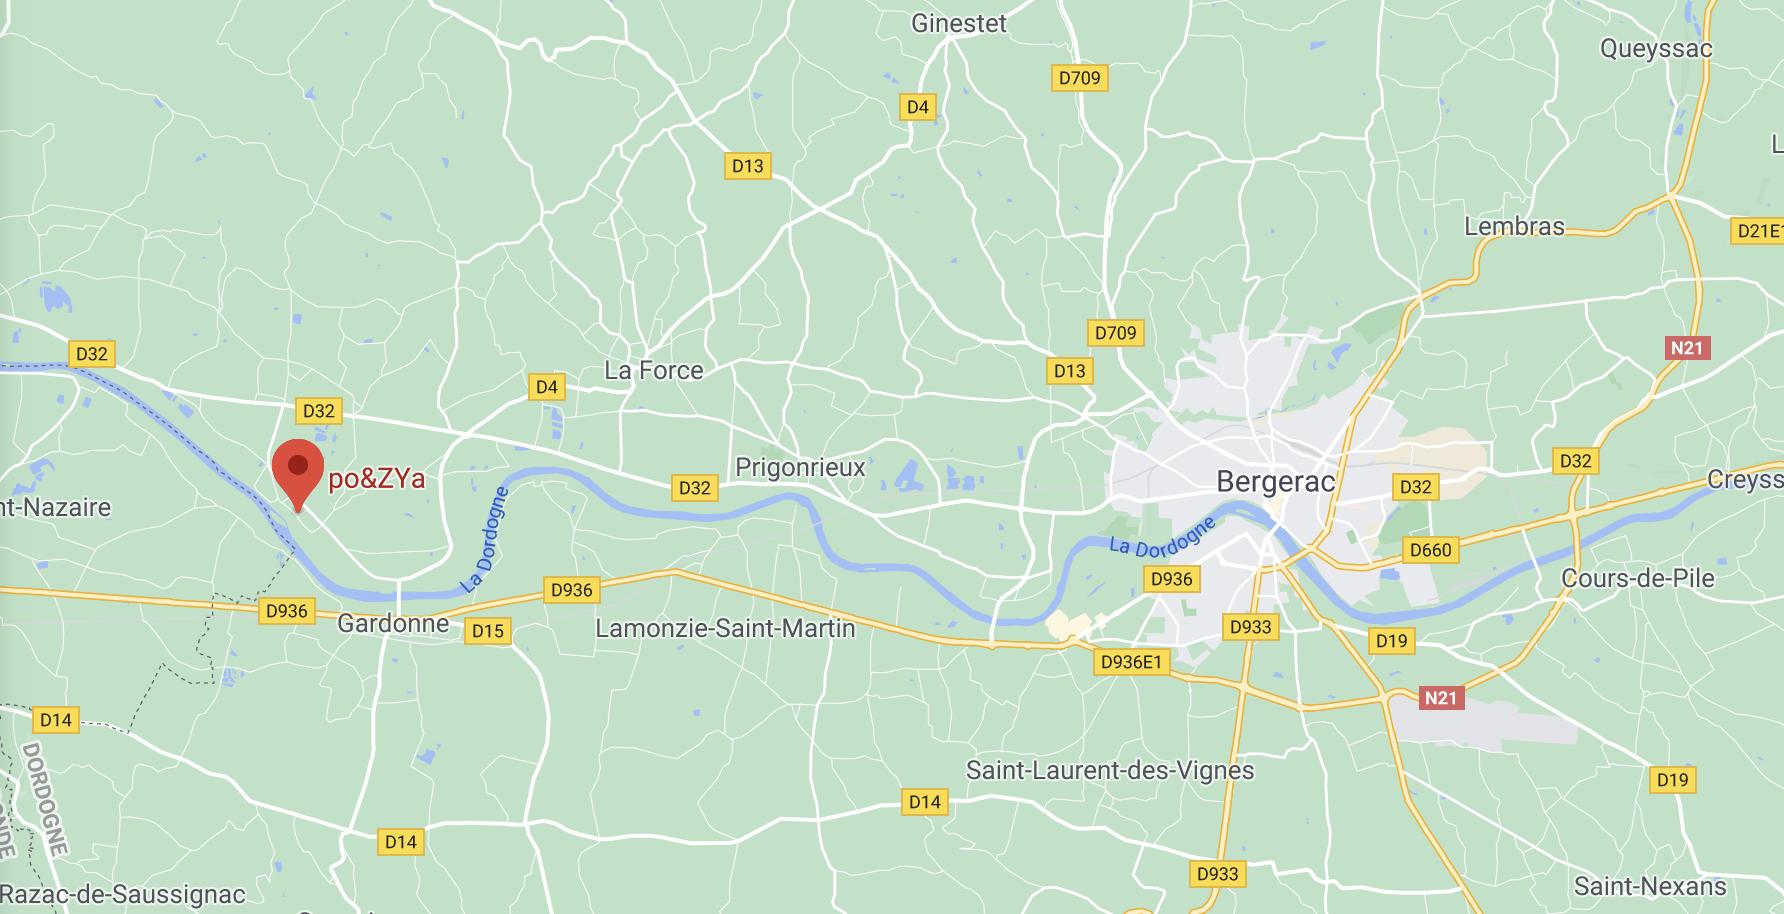 copie ecran maps Google Po&zya